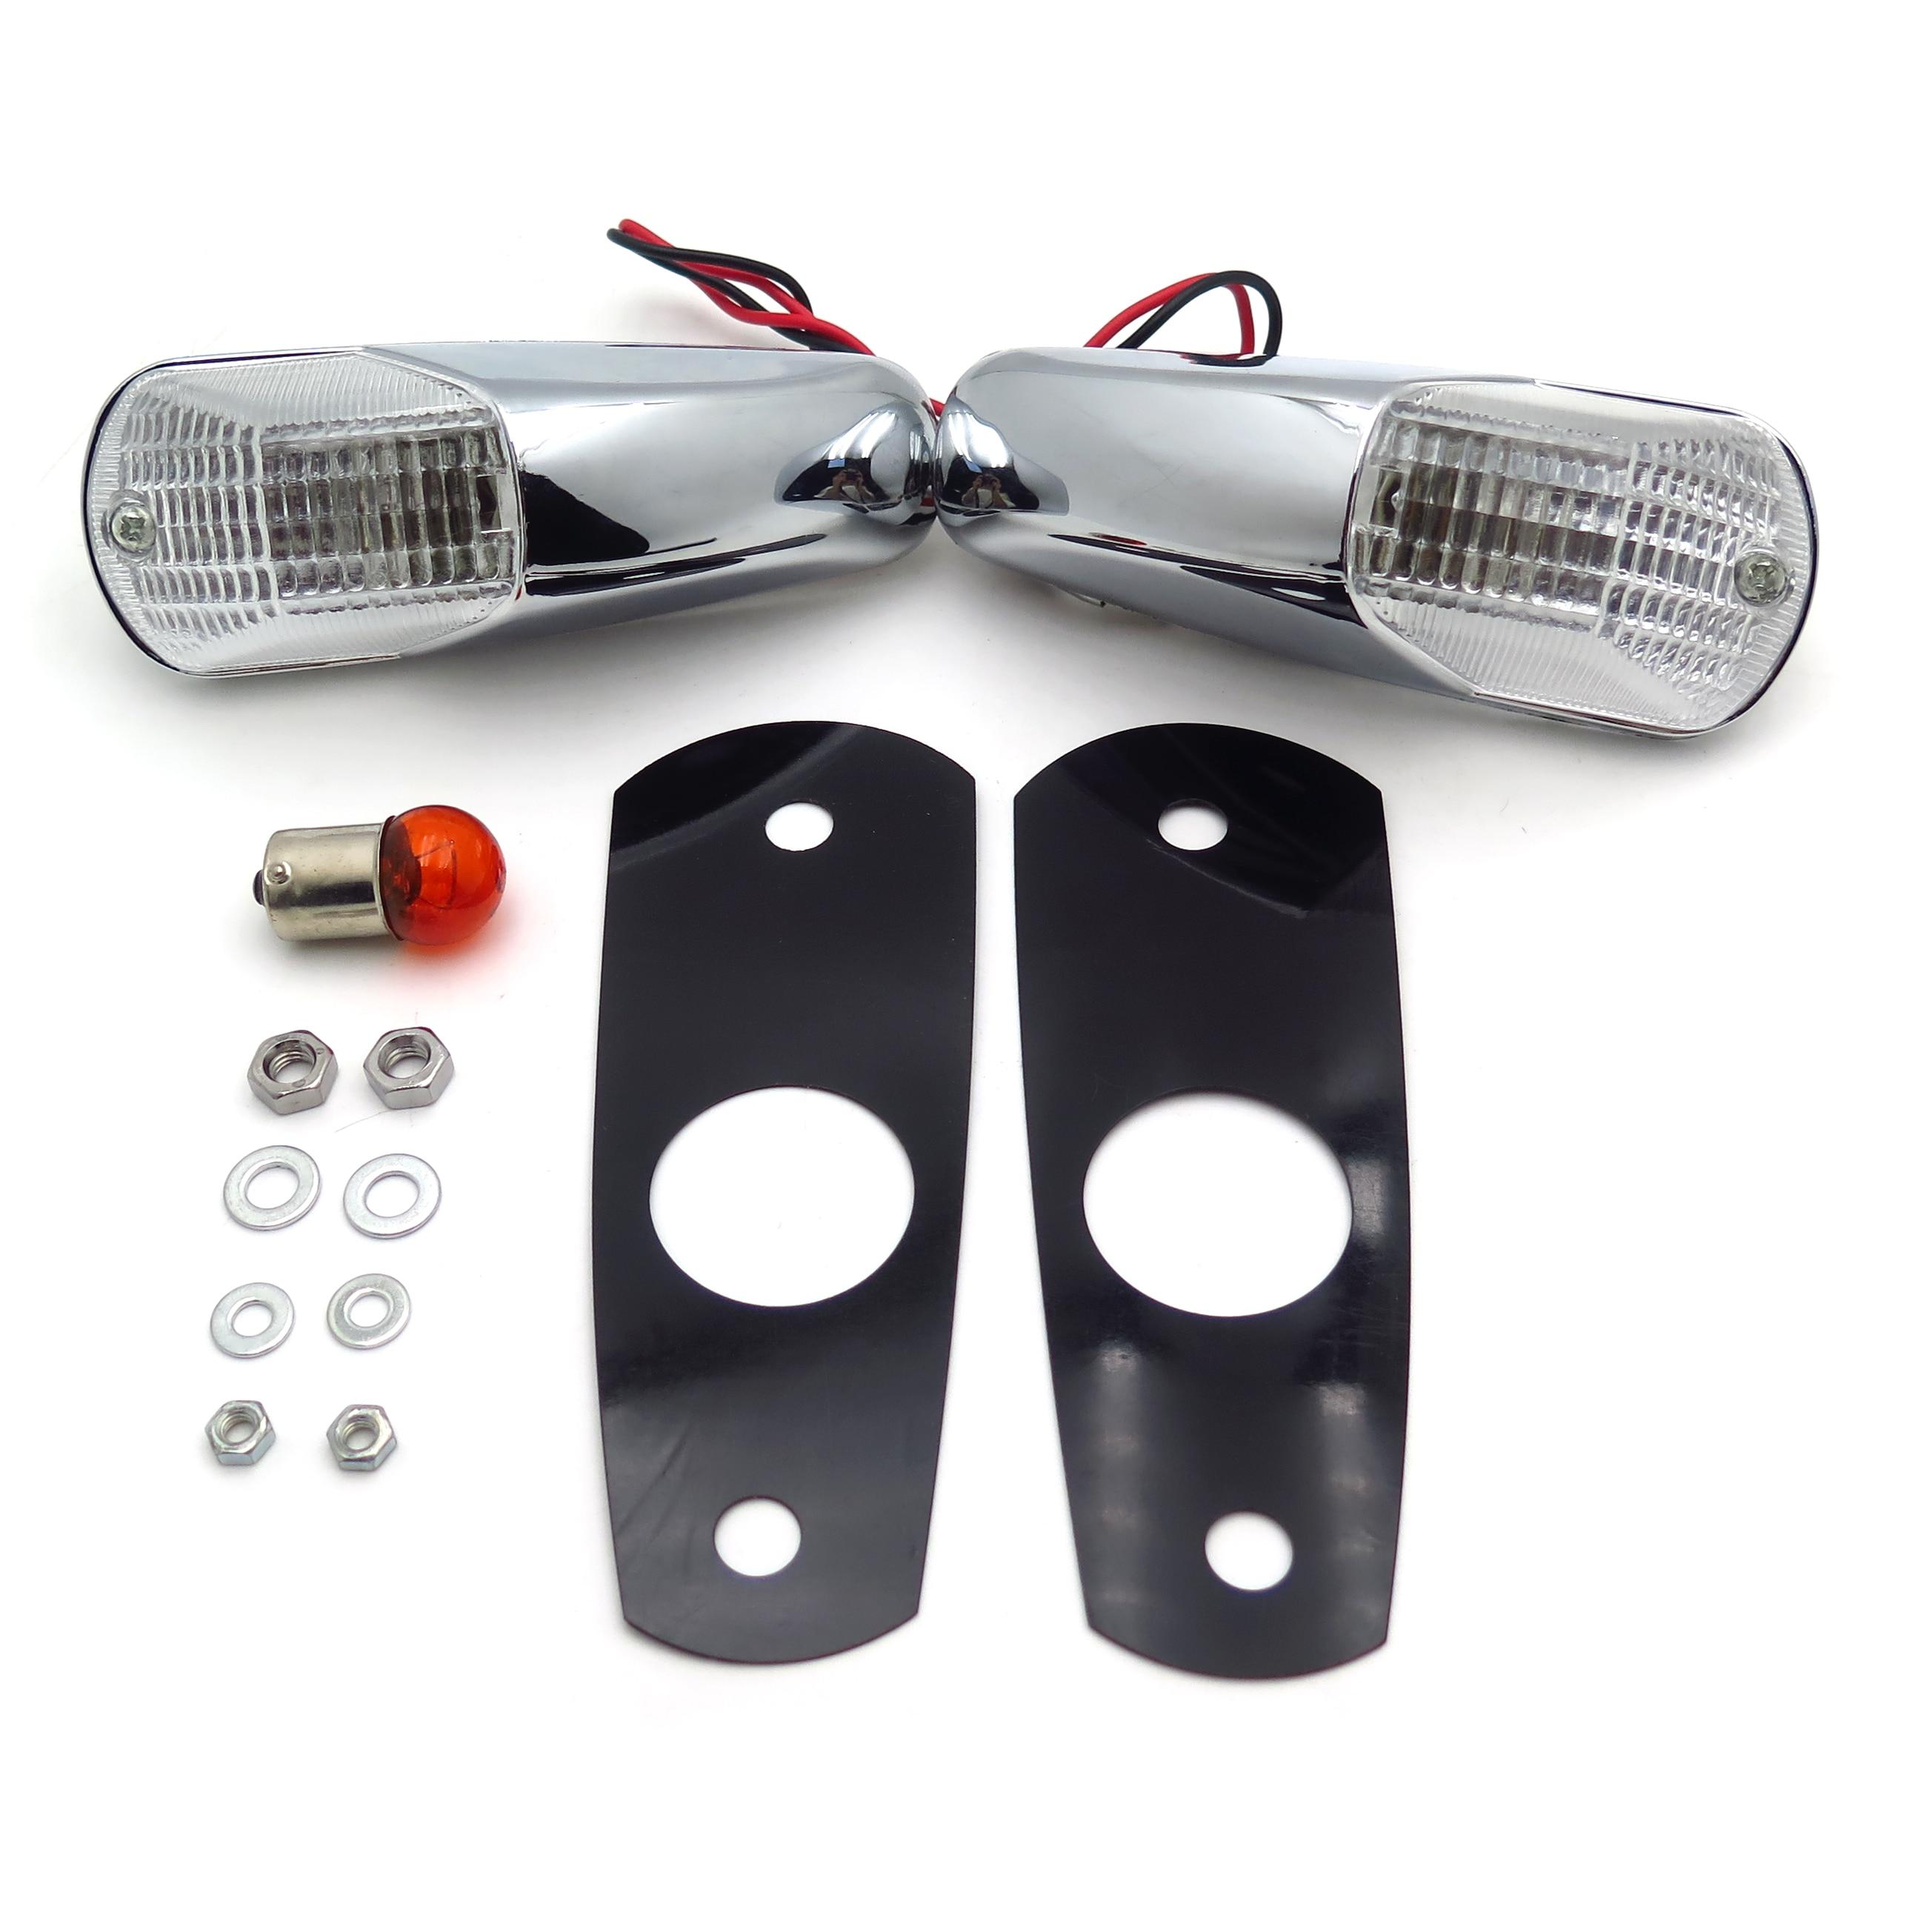 CHROME SPIKE WINDSCREEN BOLTS SCREWS For Kawasaki ZX-10R ZX-6R ZX-14RR ZZR 1400